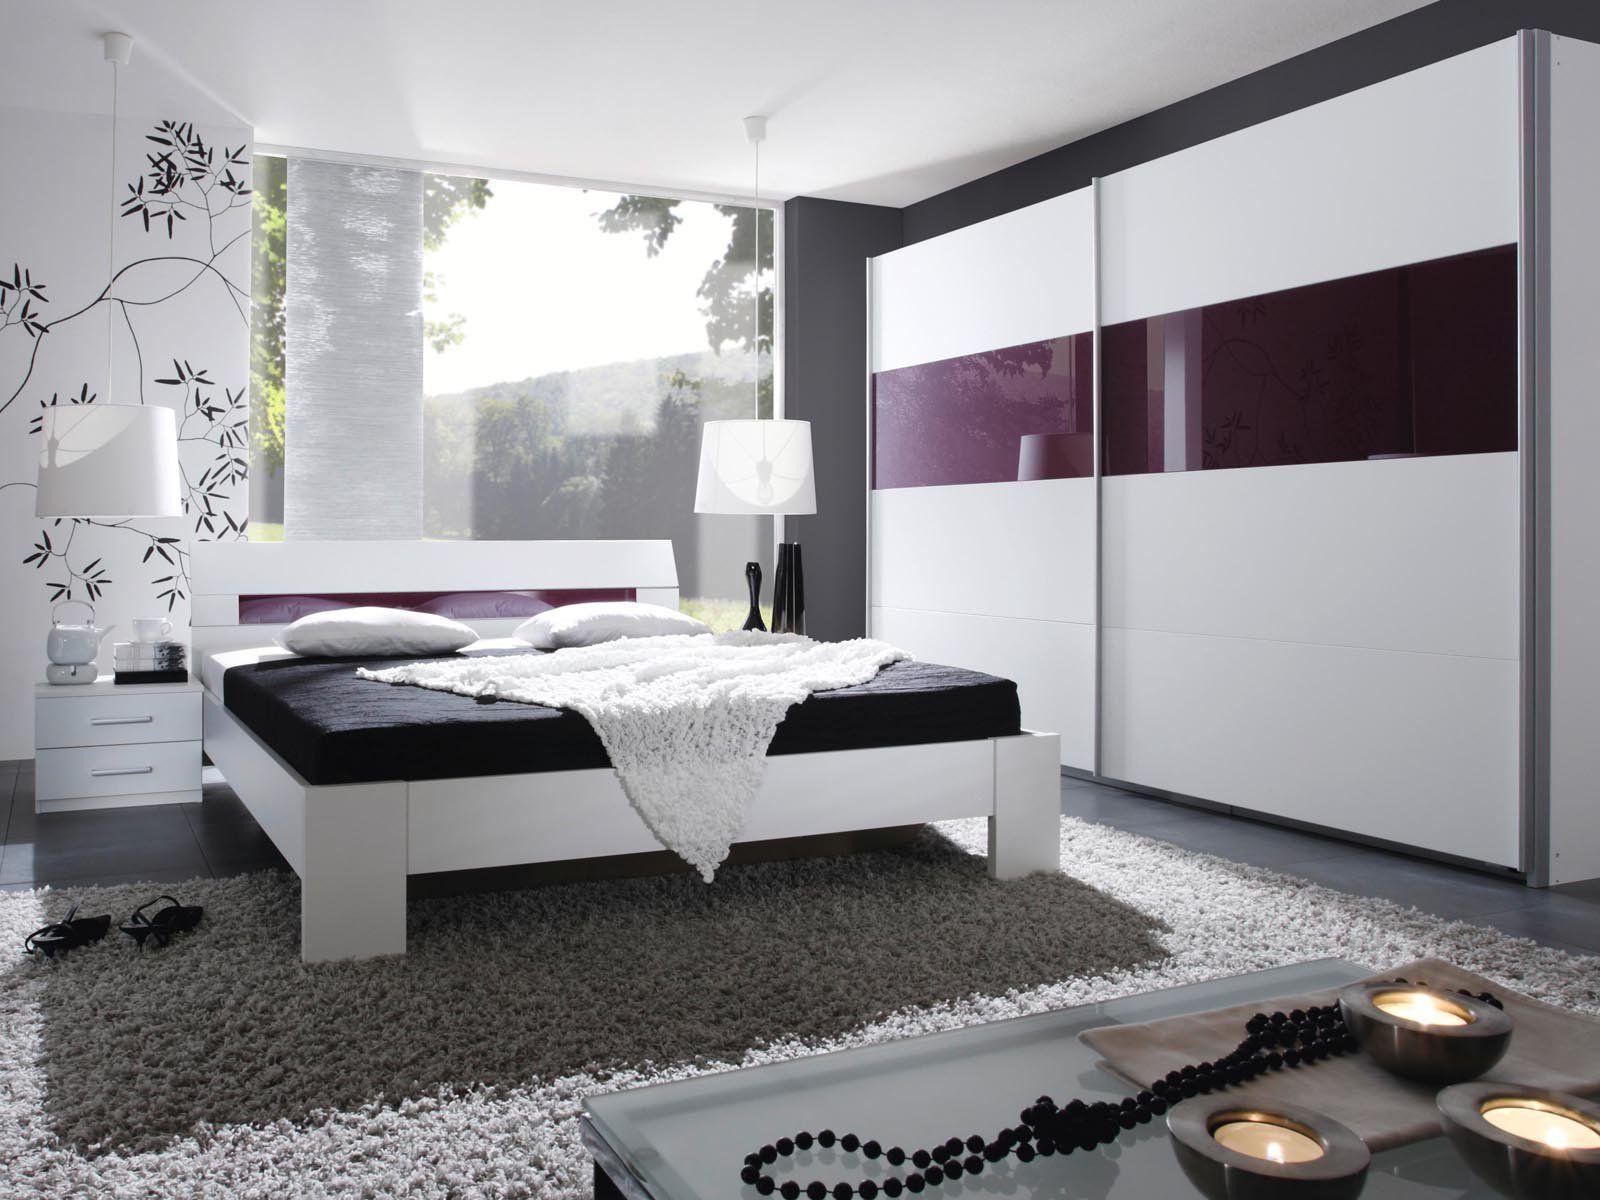 Chambre Blanc Violet Recherche Google Deco Chambre A Coucher Chambre A Coucher Blanche Chambre Mauve